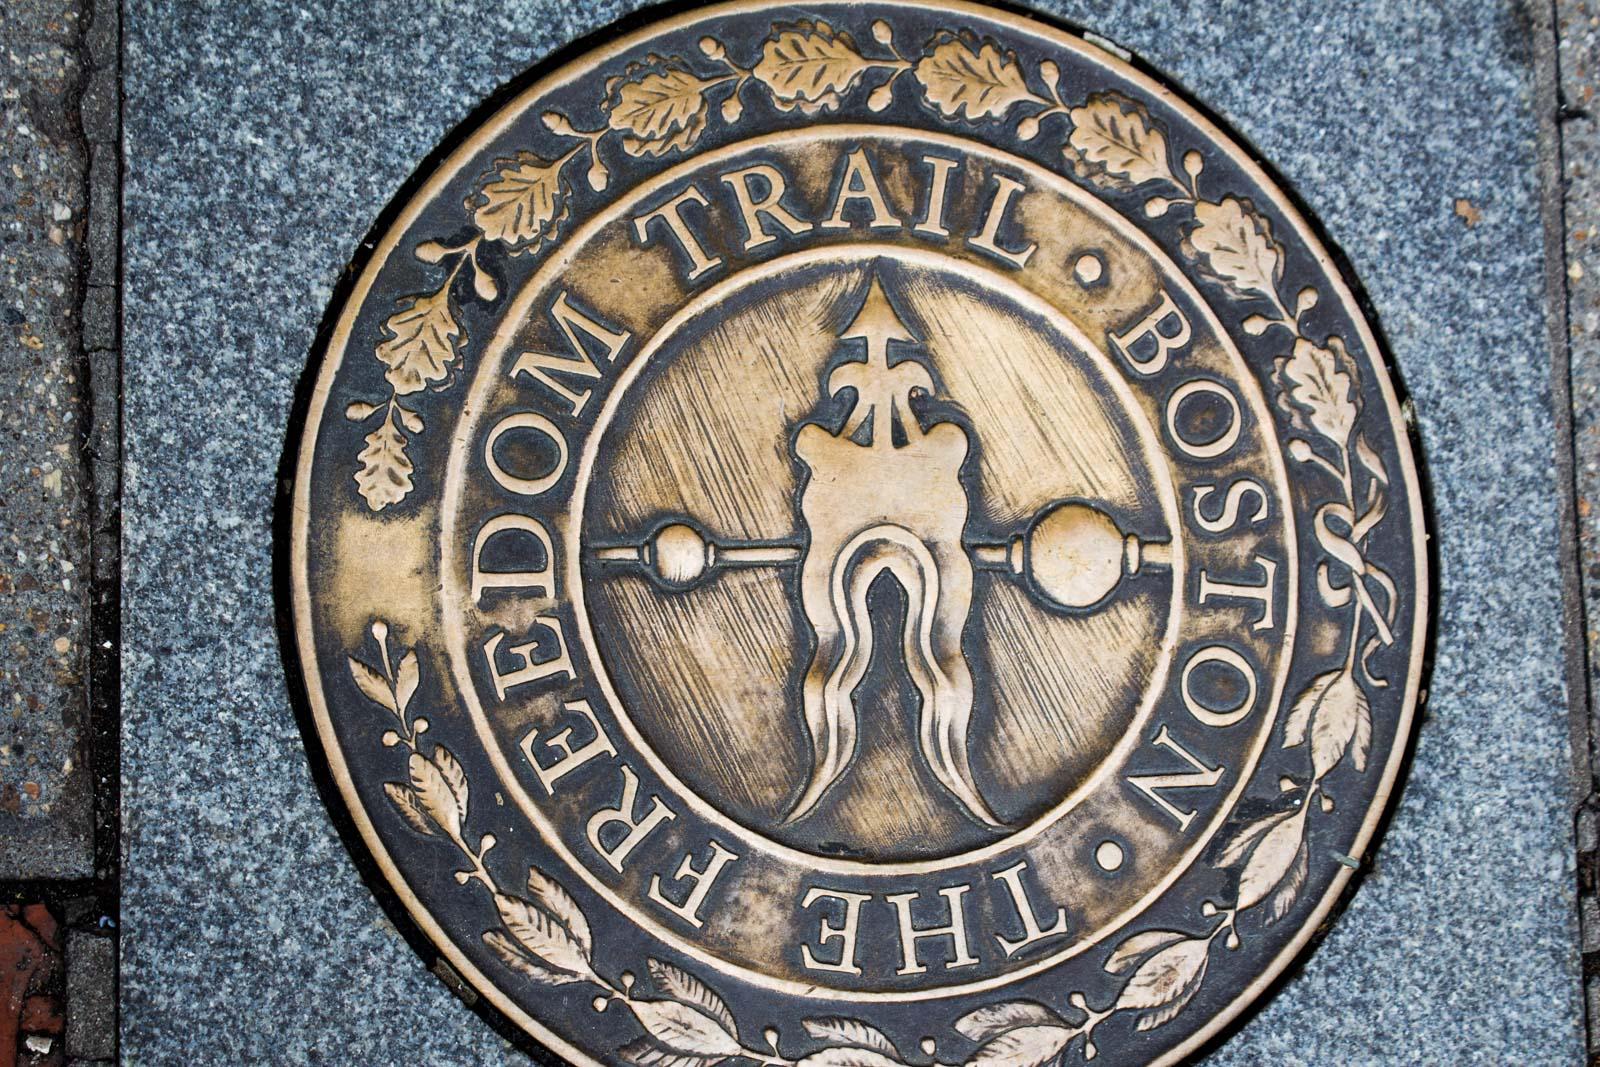 Visiting the Boston Freedom Trail, USA